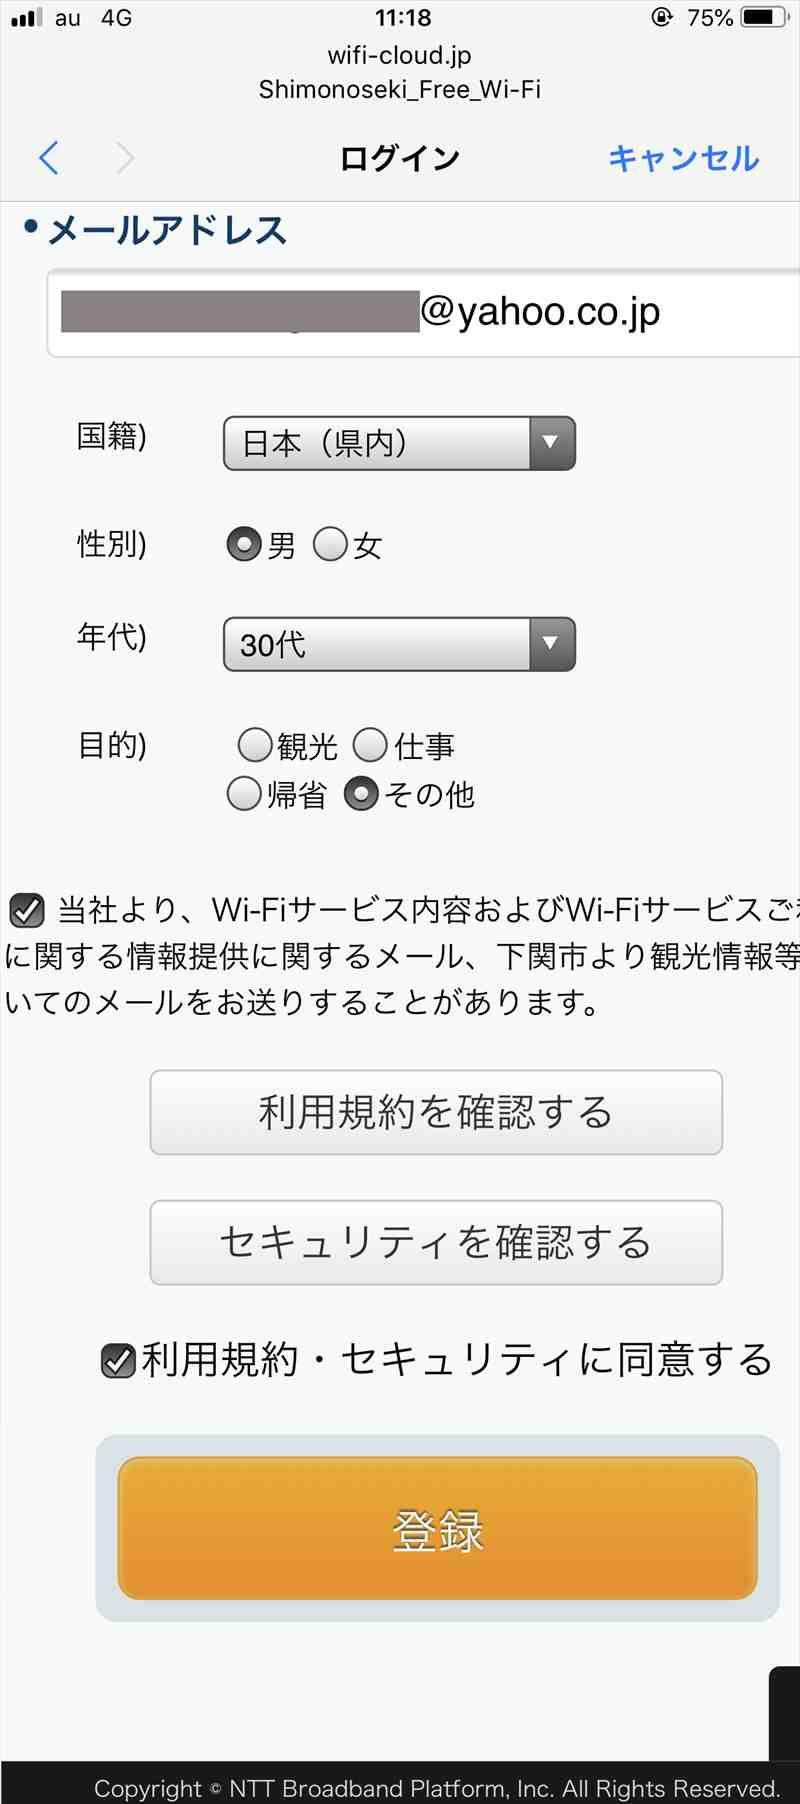 フリーWi-Fi登録